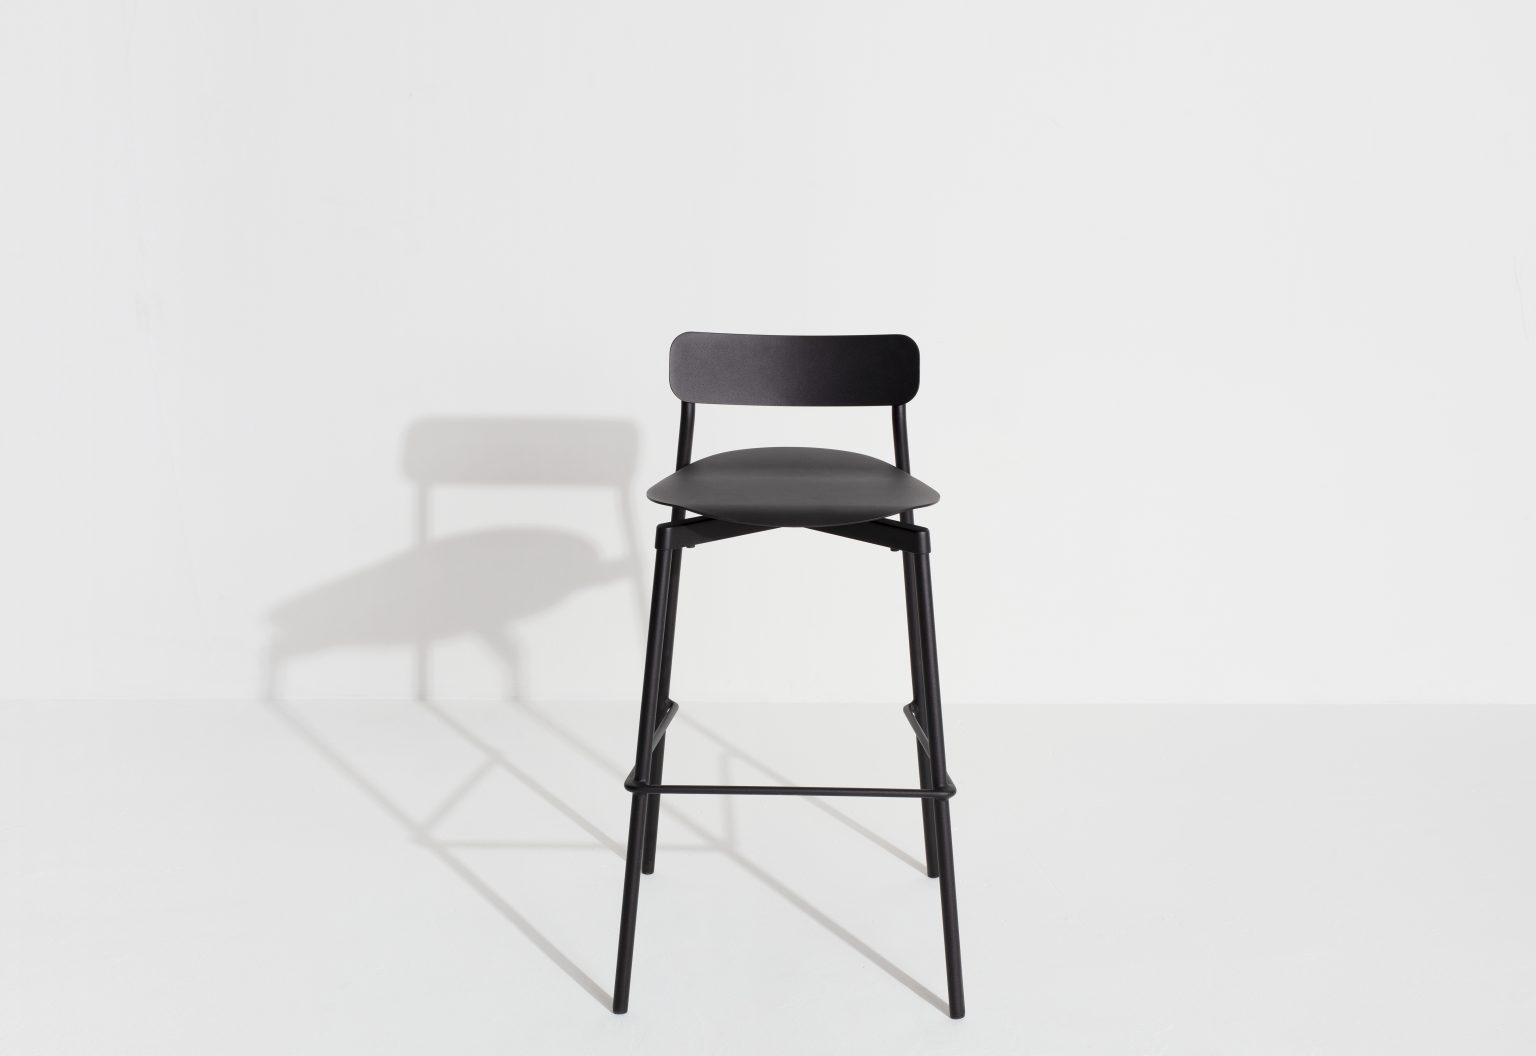 Biennale Interieur - Belgium's leading design and interior event - M0810401_fromme_bar_stool_black_©pf_packshot_hd.jpg